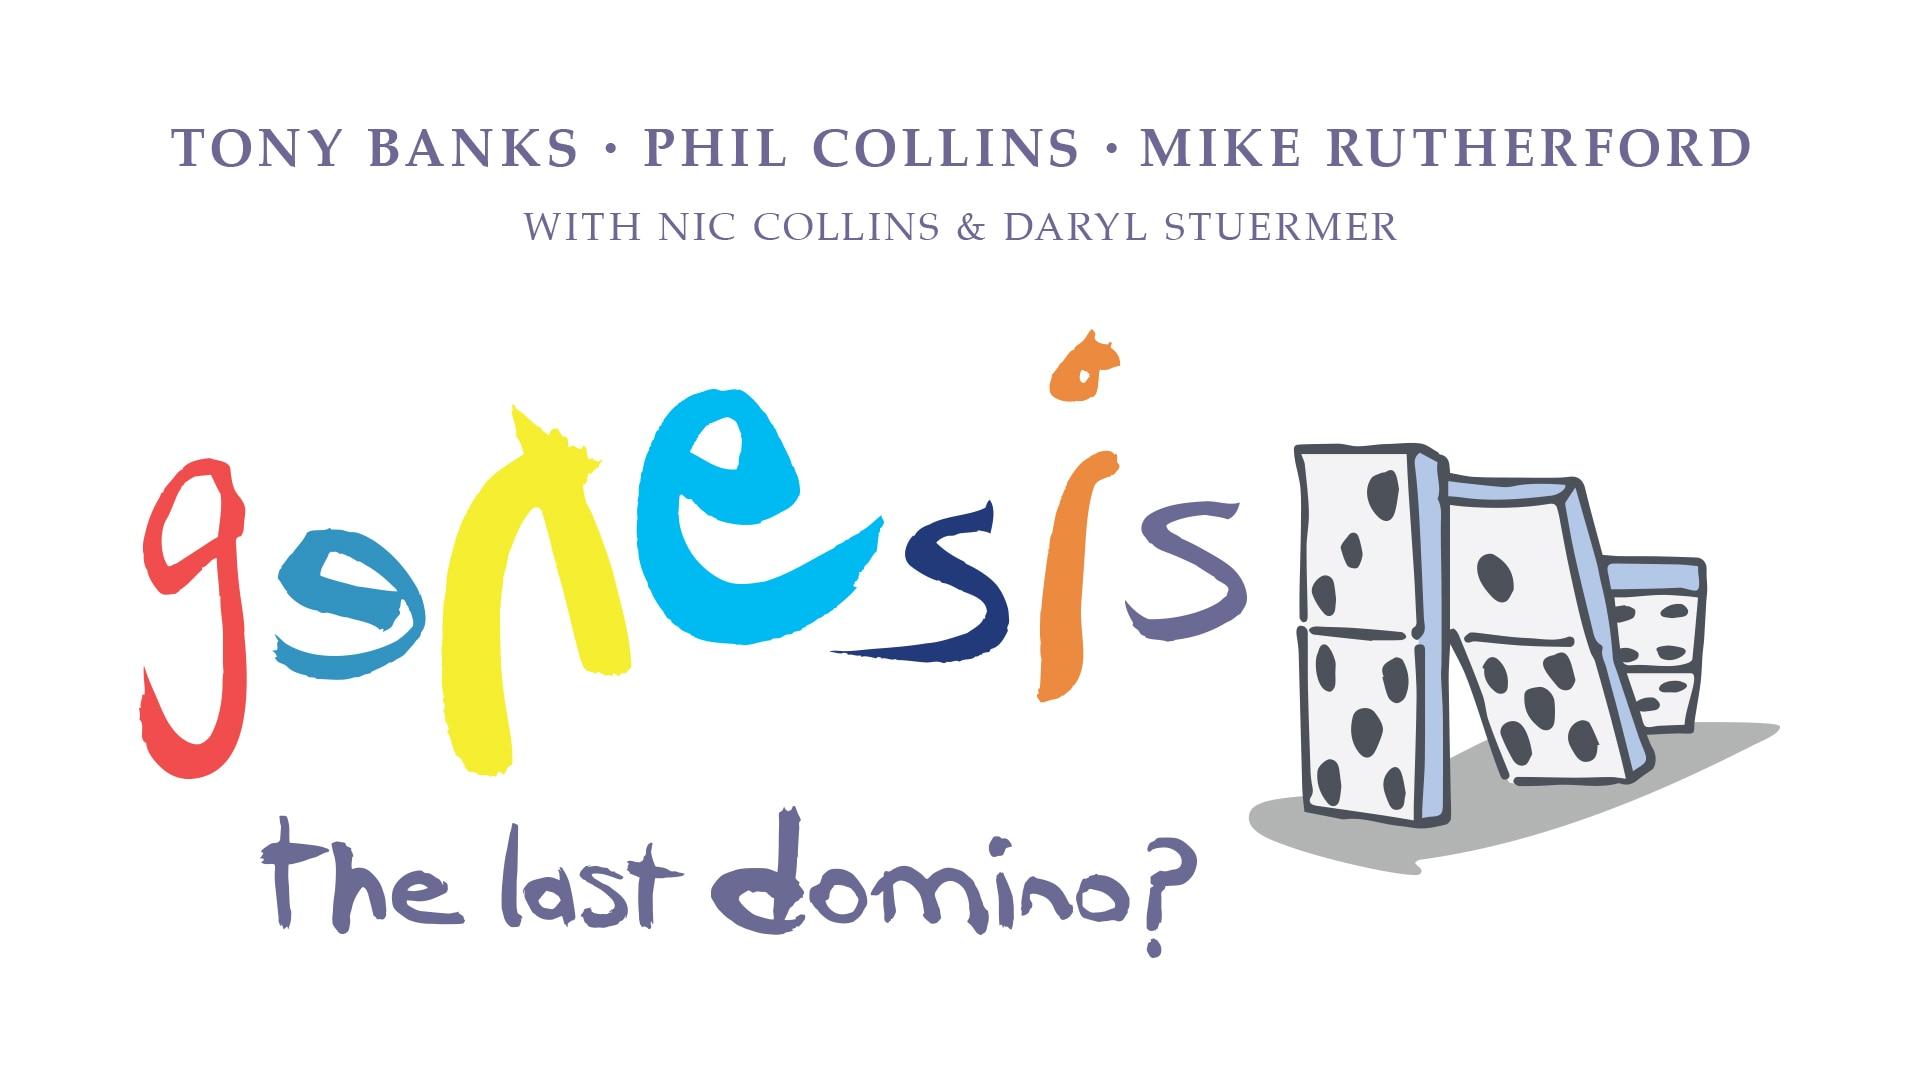 Genesis The Last Domino? Tour!  Thursday, November 18th